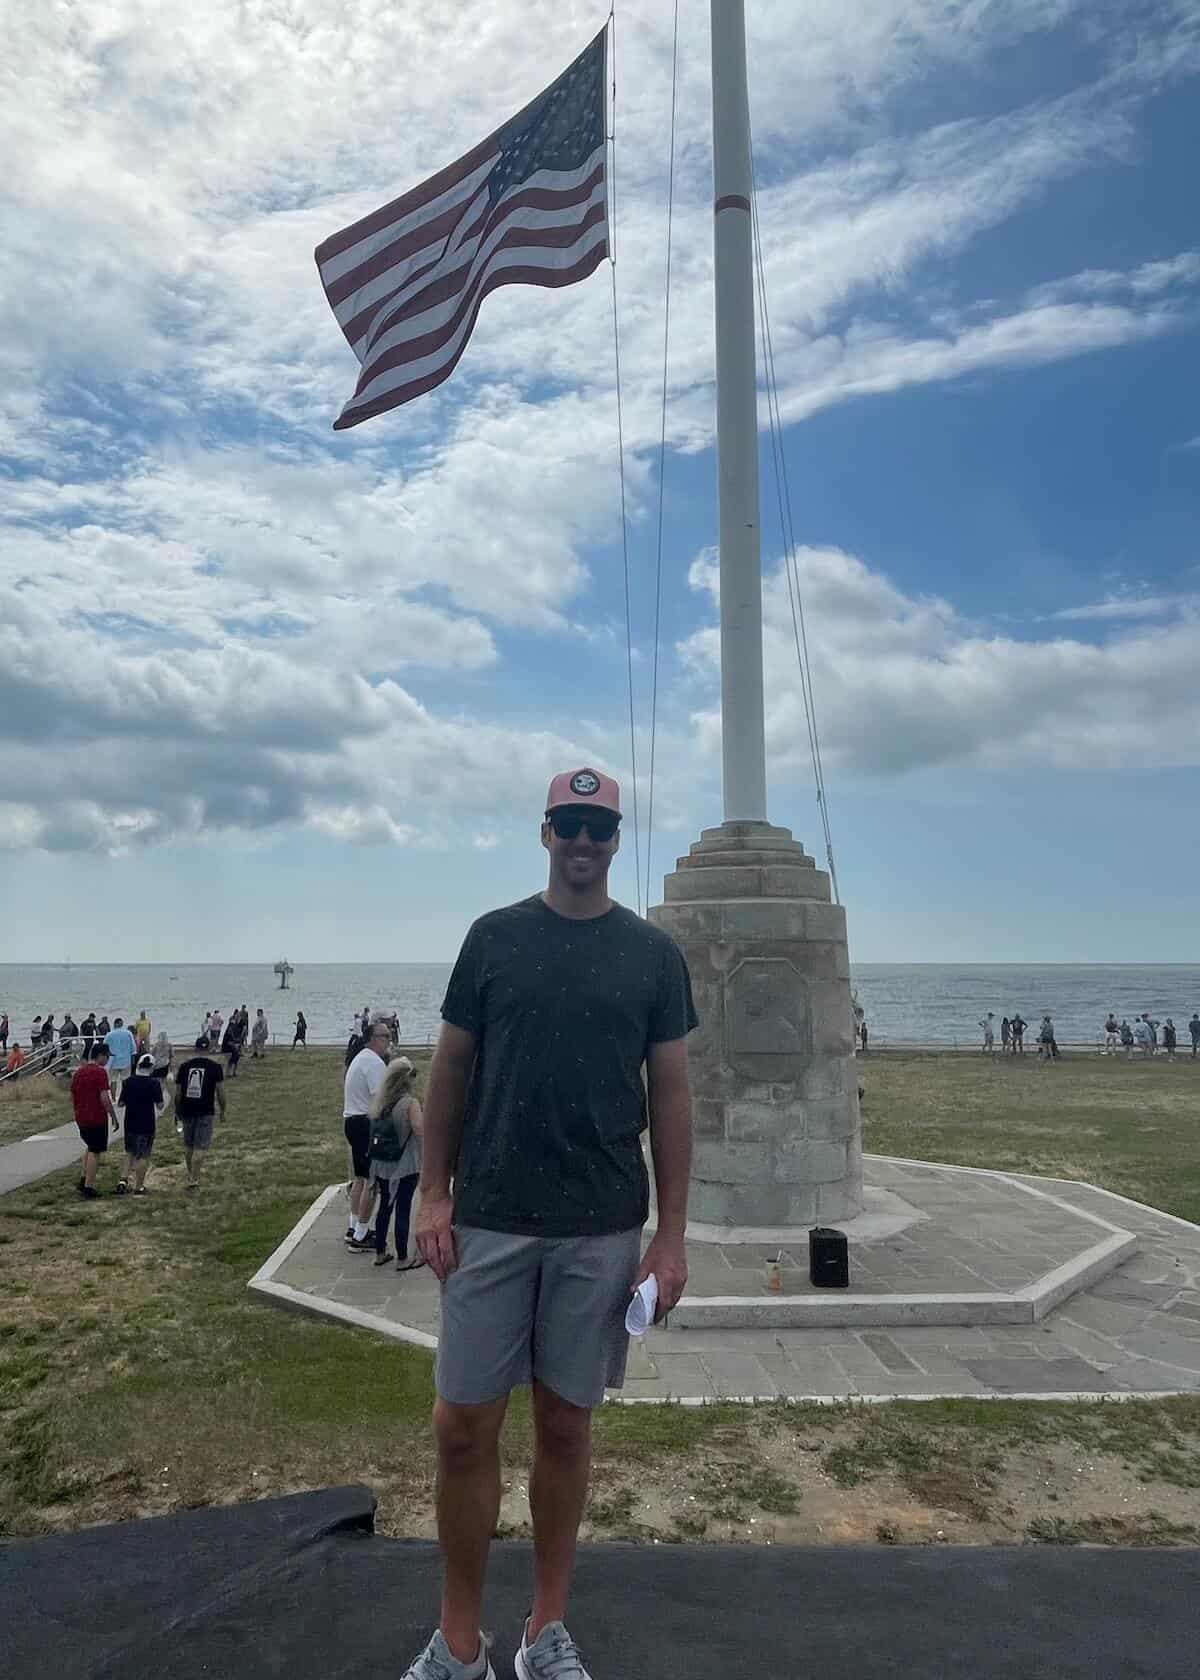 fort Sumter national monument charleston